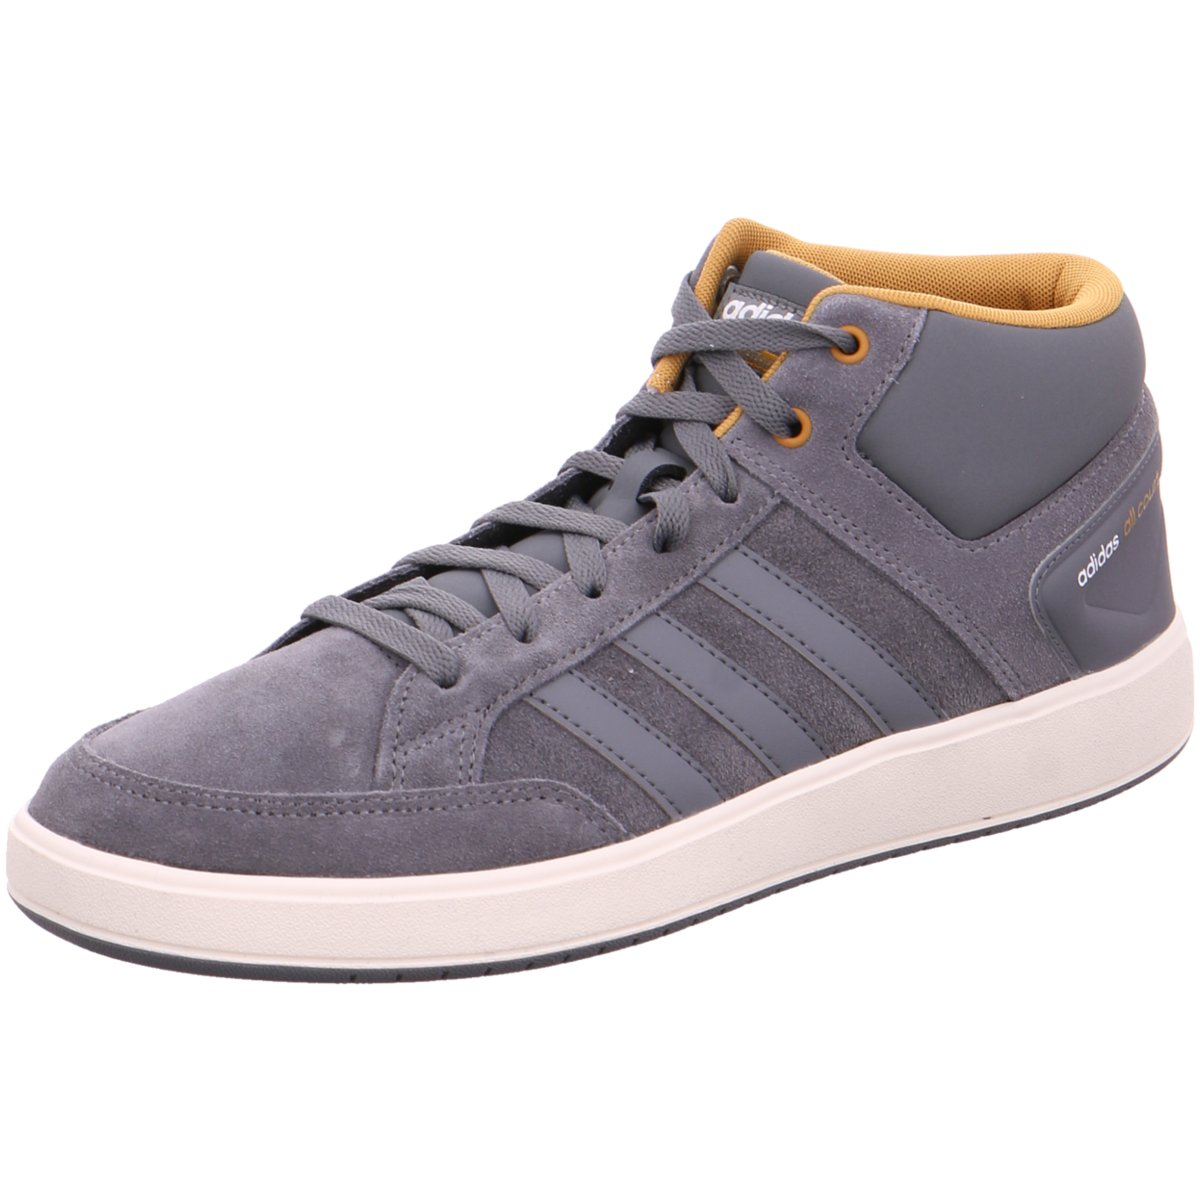 NEU adidas Herren Sneaker CF ALL COURT MID BB9956 grau 354387   eBay bba3faae44